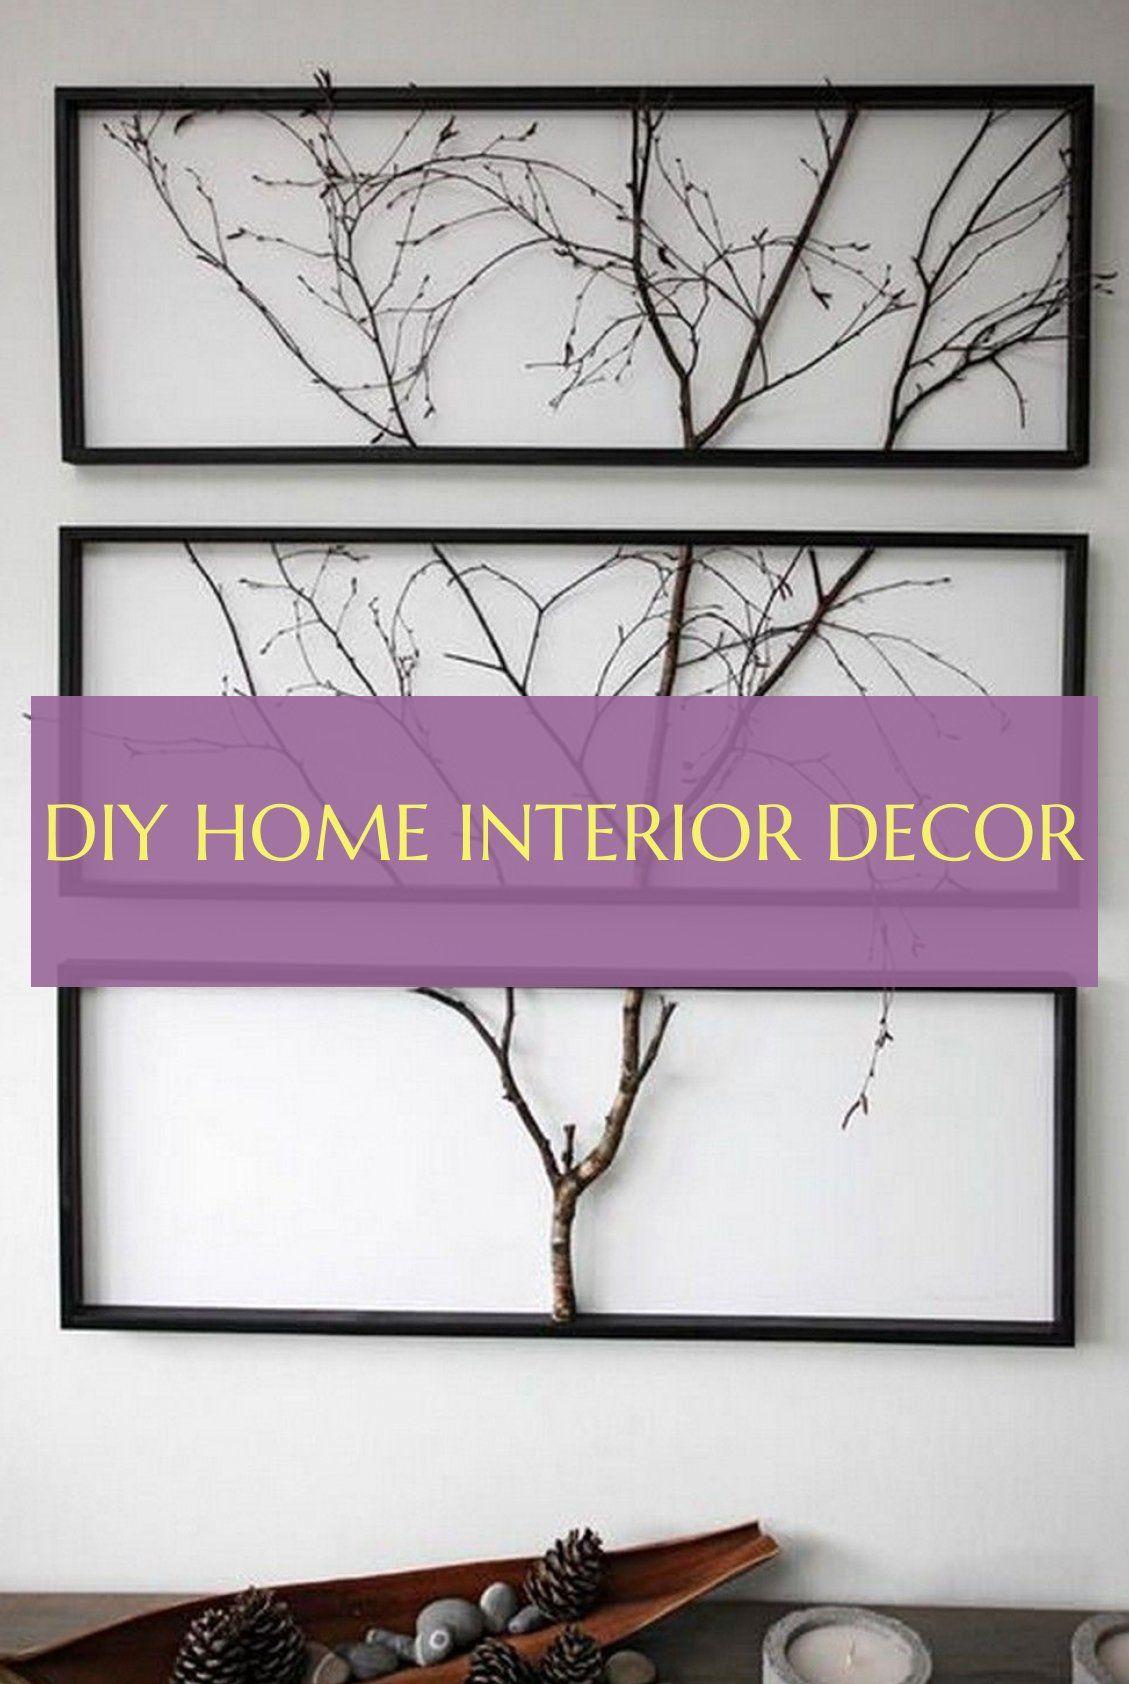 Interior Design Fai Da Te arredamento d'interni fai da te   diy home interior